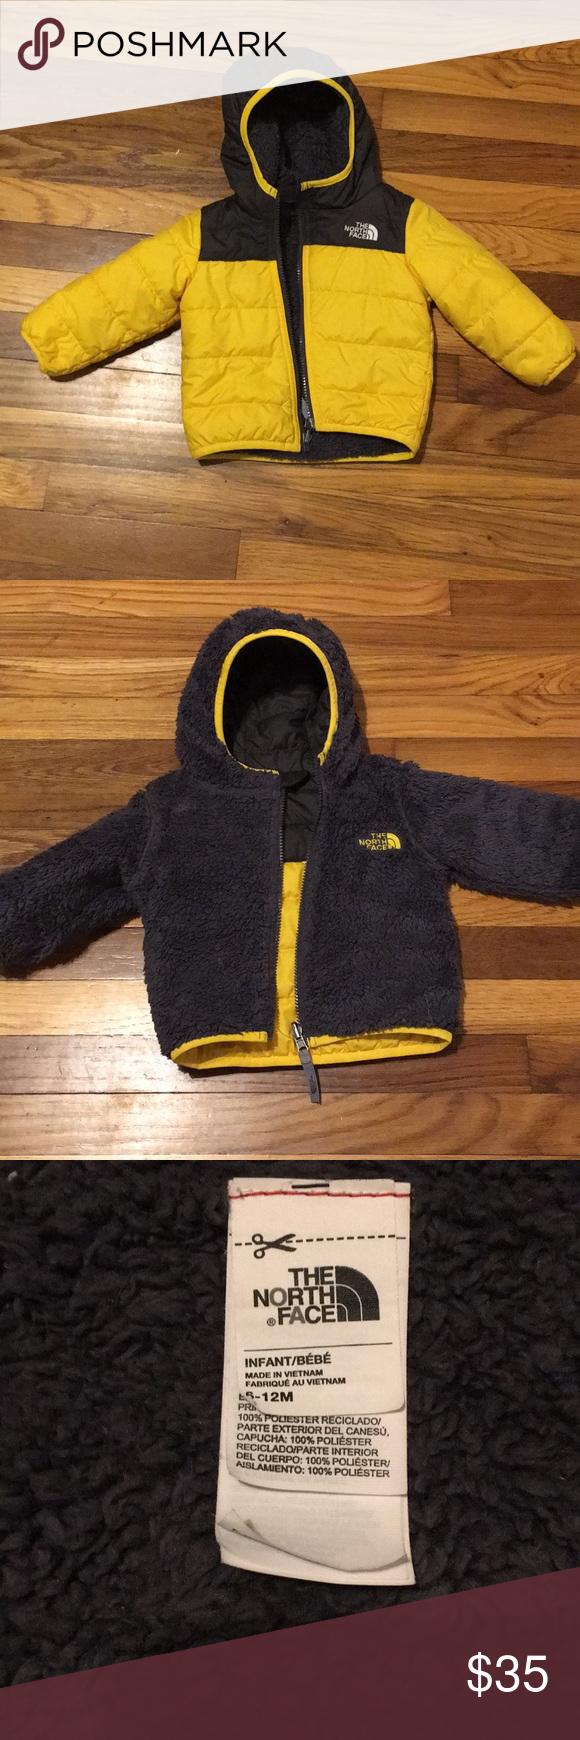 Reversible Infant Northface Kids Jacket Winter Outfits Black N Yellow [ 1740 x 580 Pixel ]